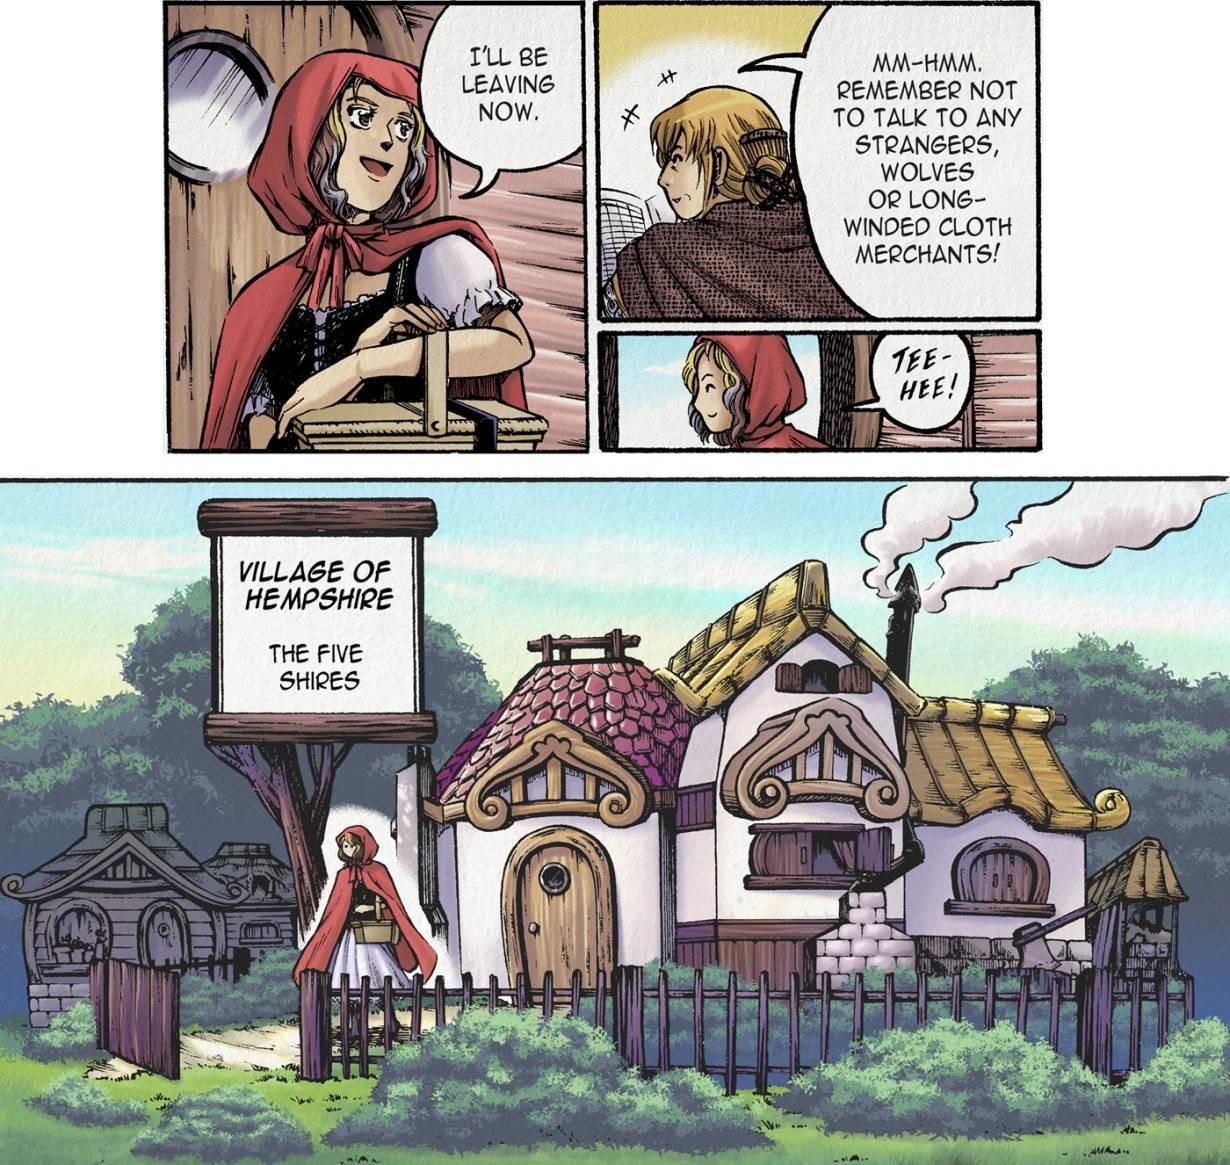 Manga-style art created by Australian comic artist Queenie Chan.